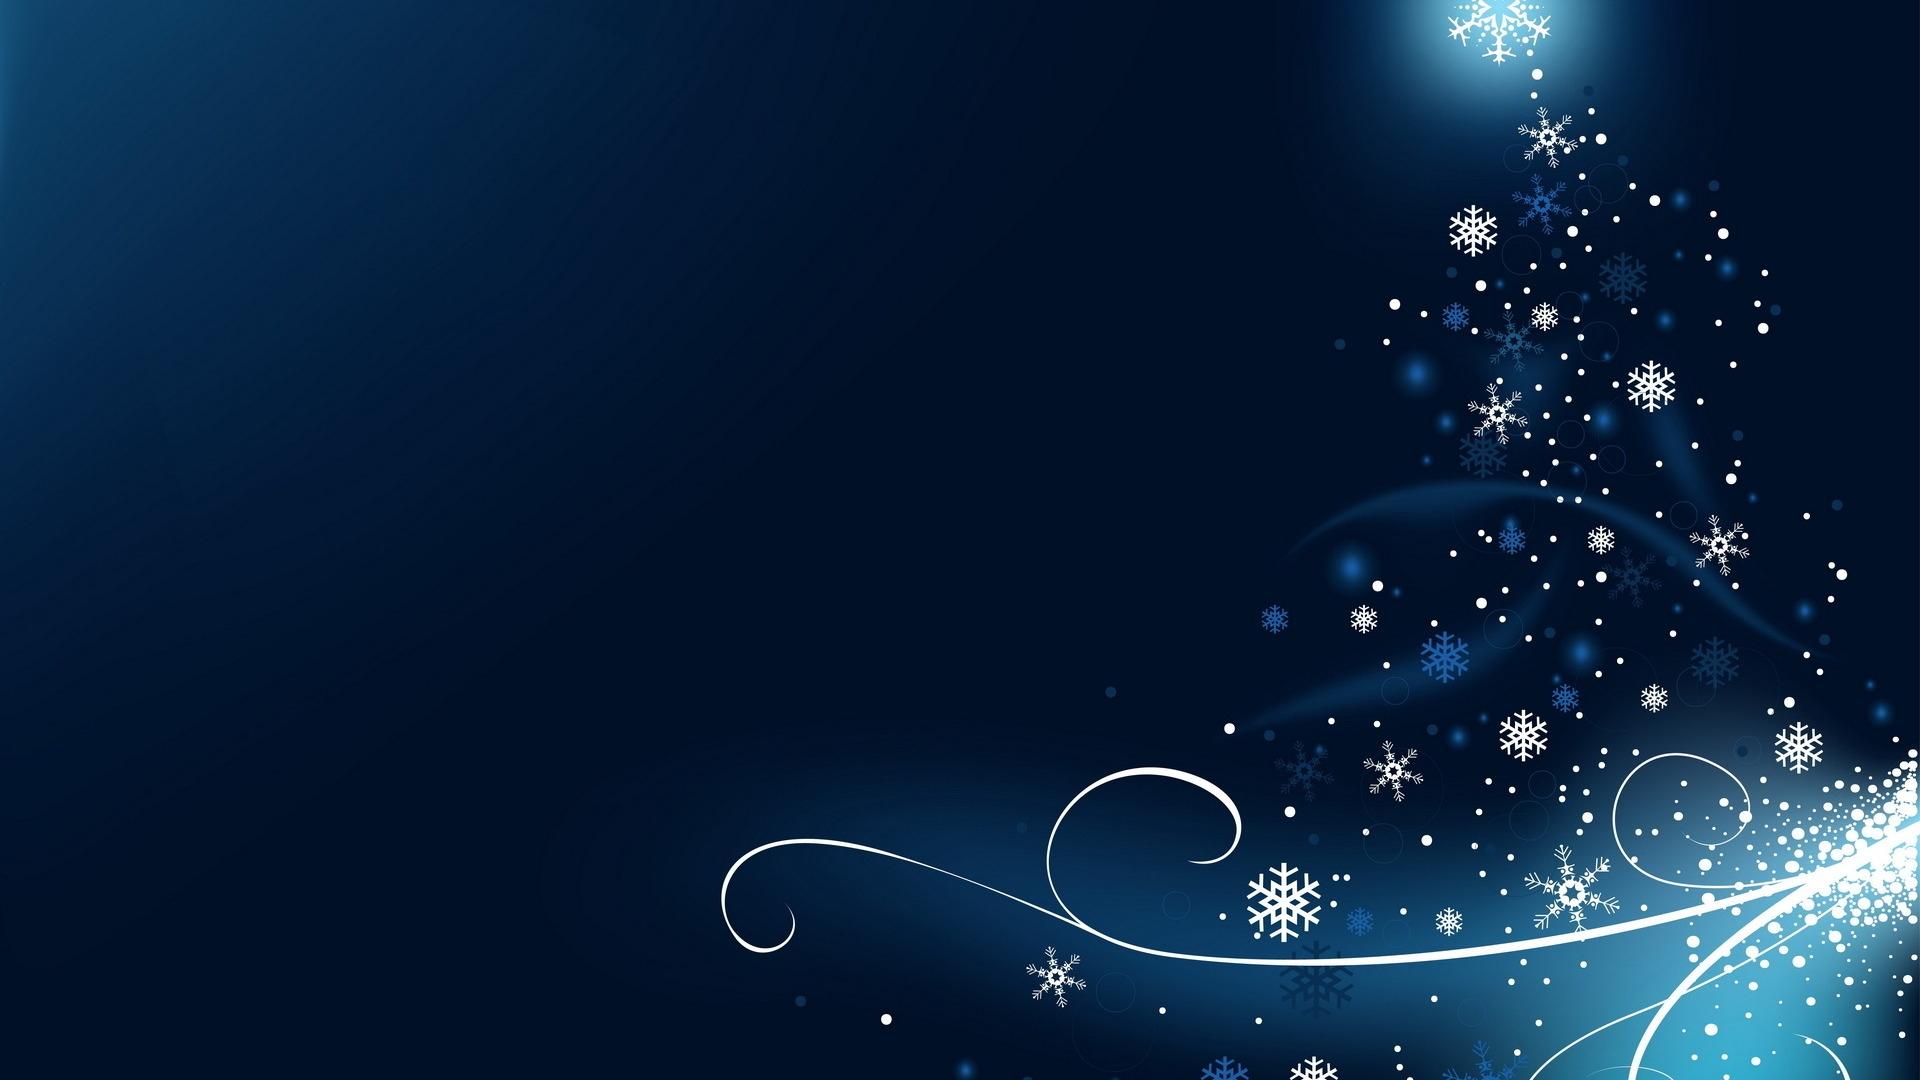 snowflake tree wallpaper 49059